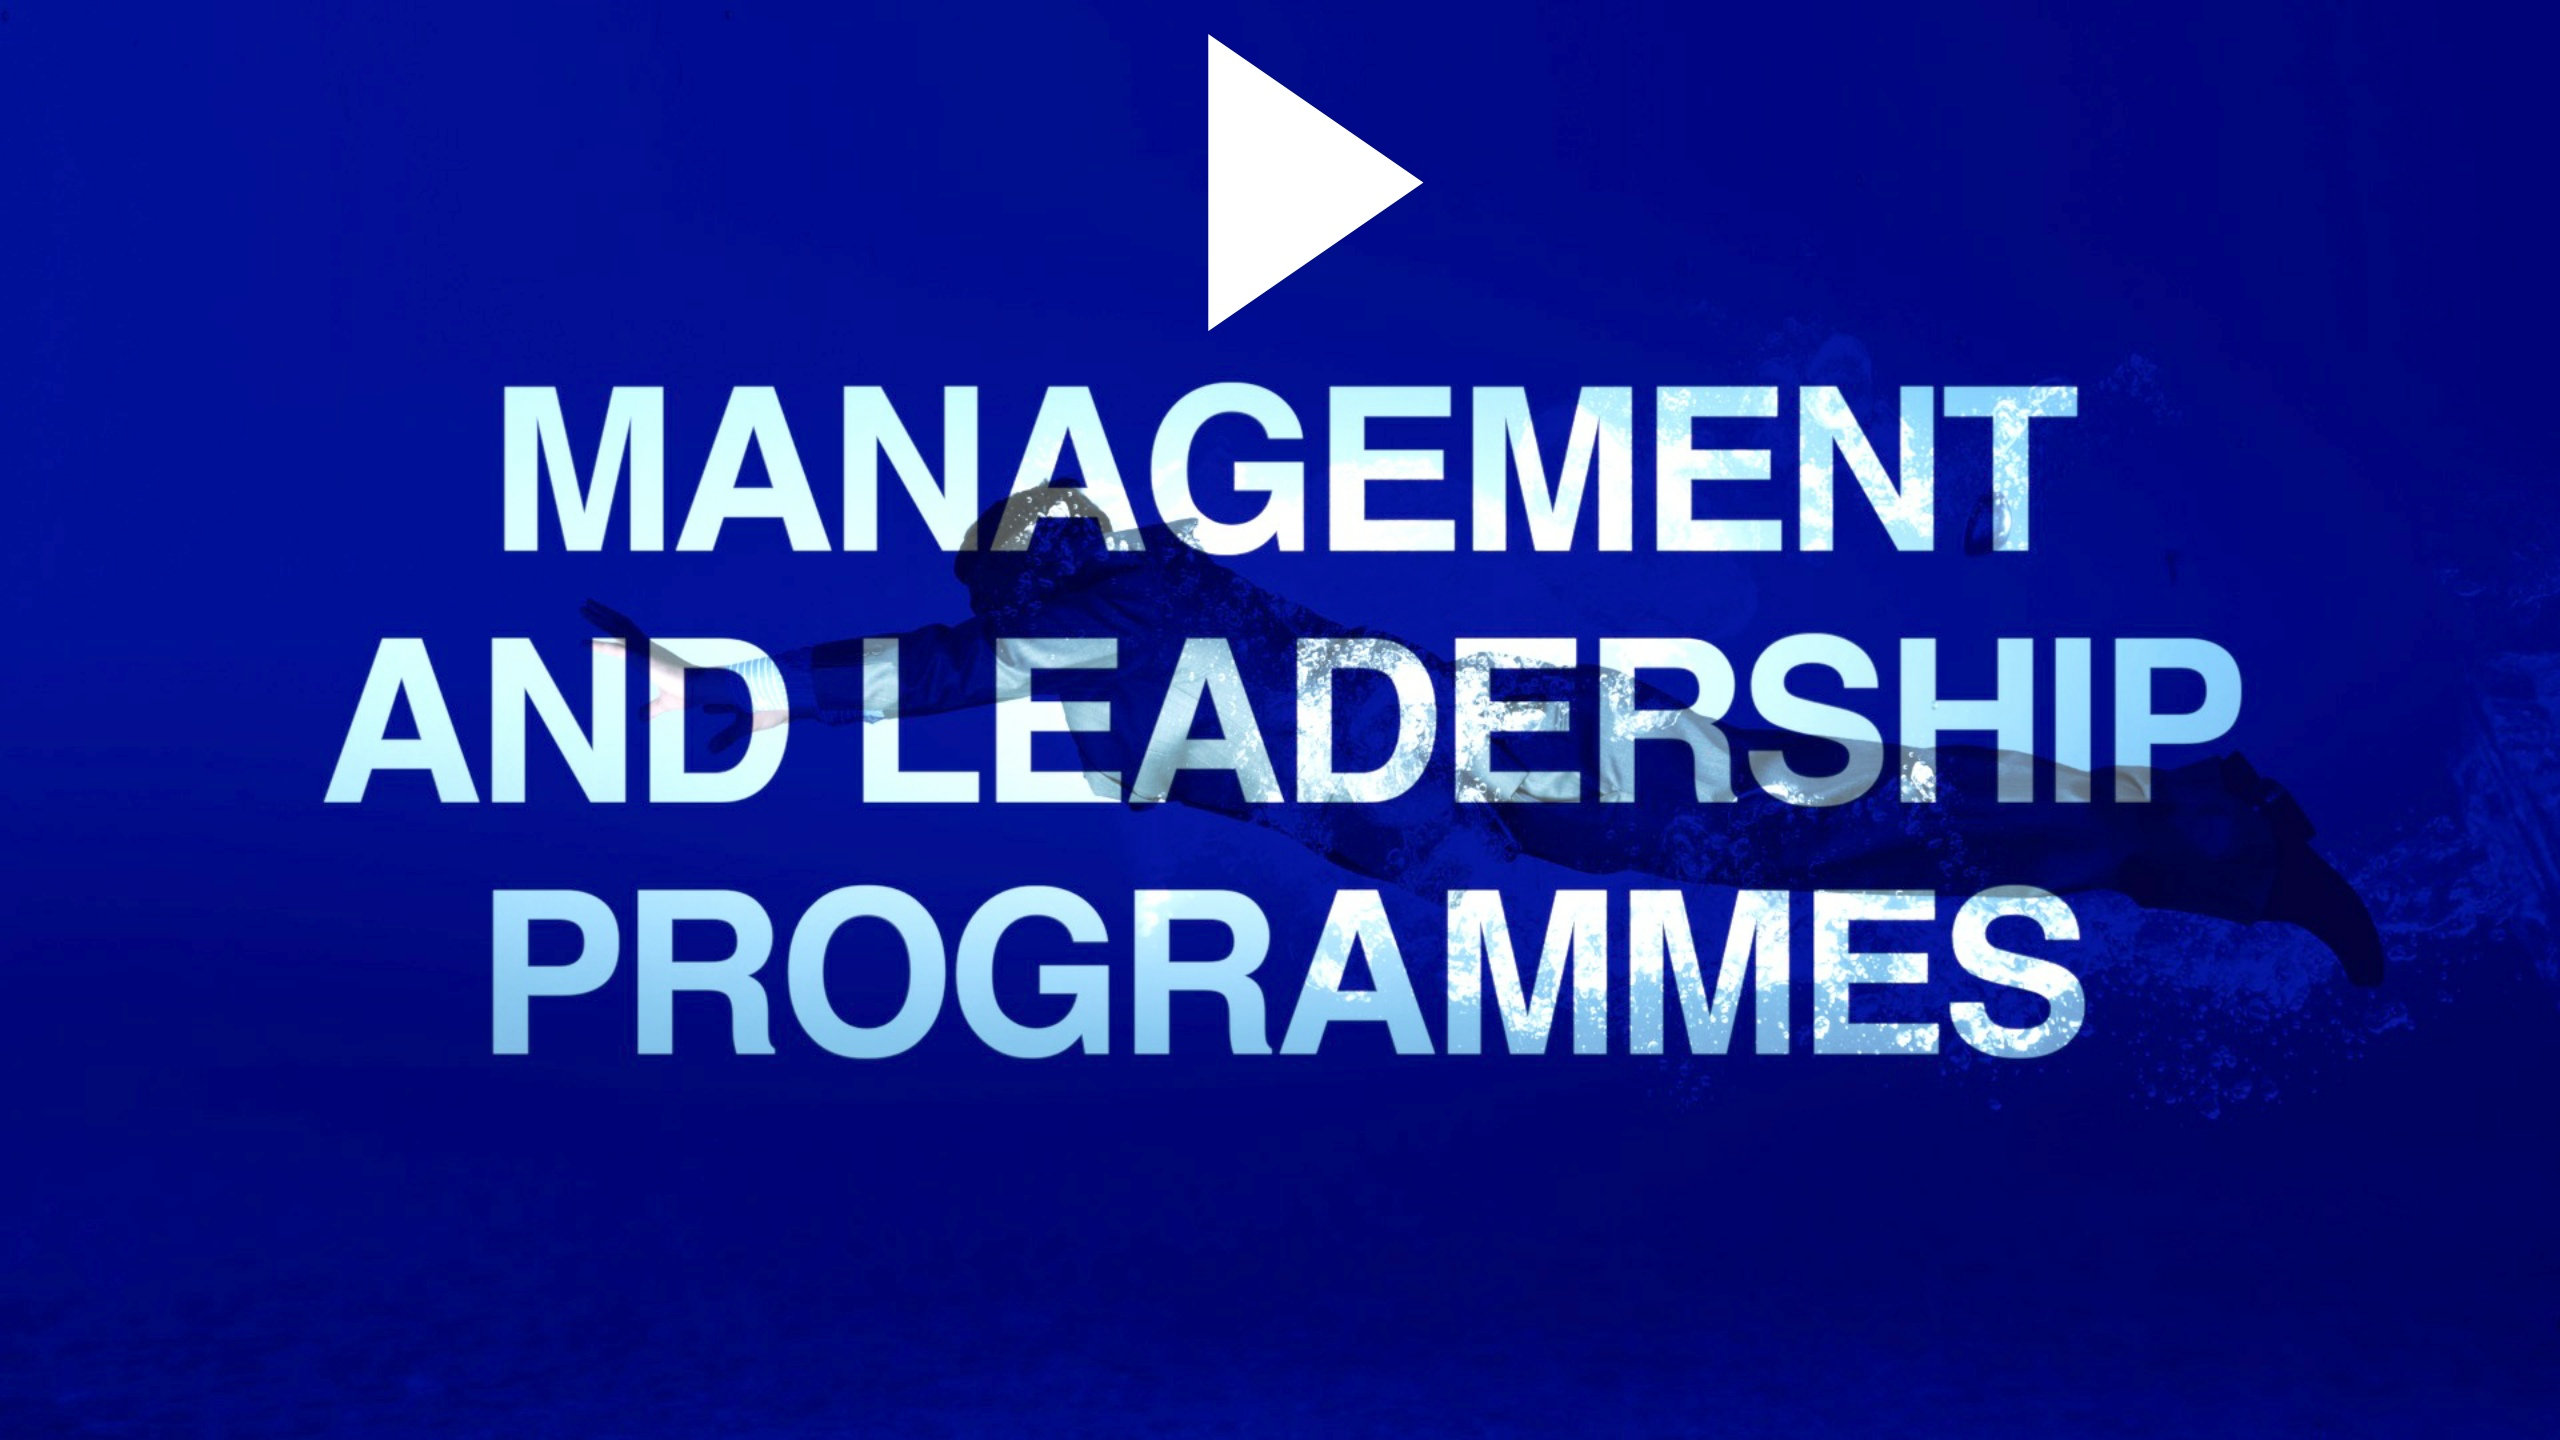 Management and leadership workshops and programmes